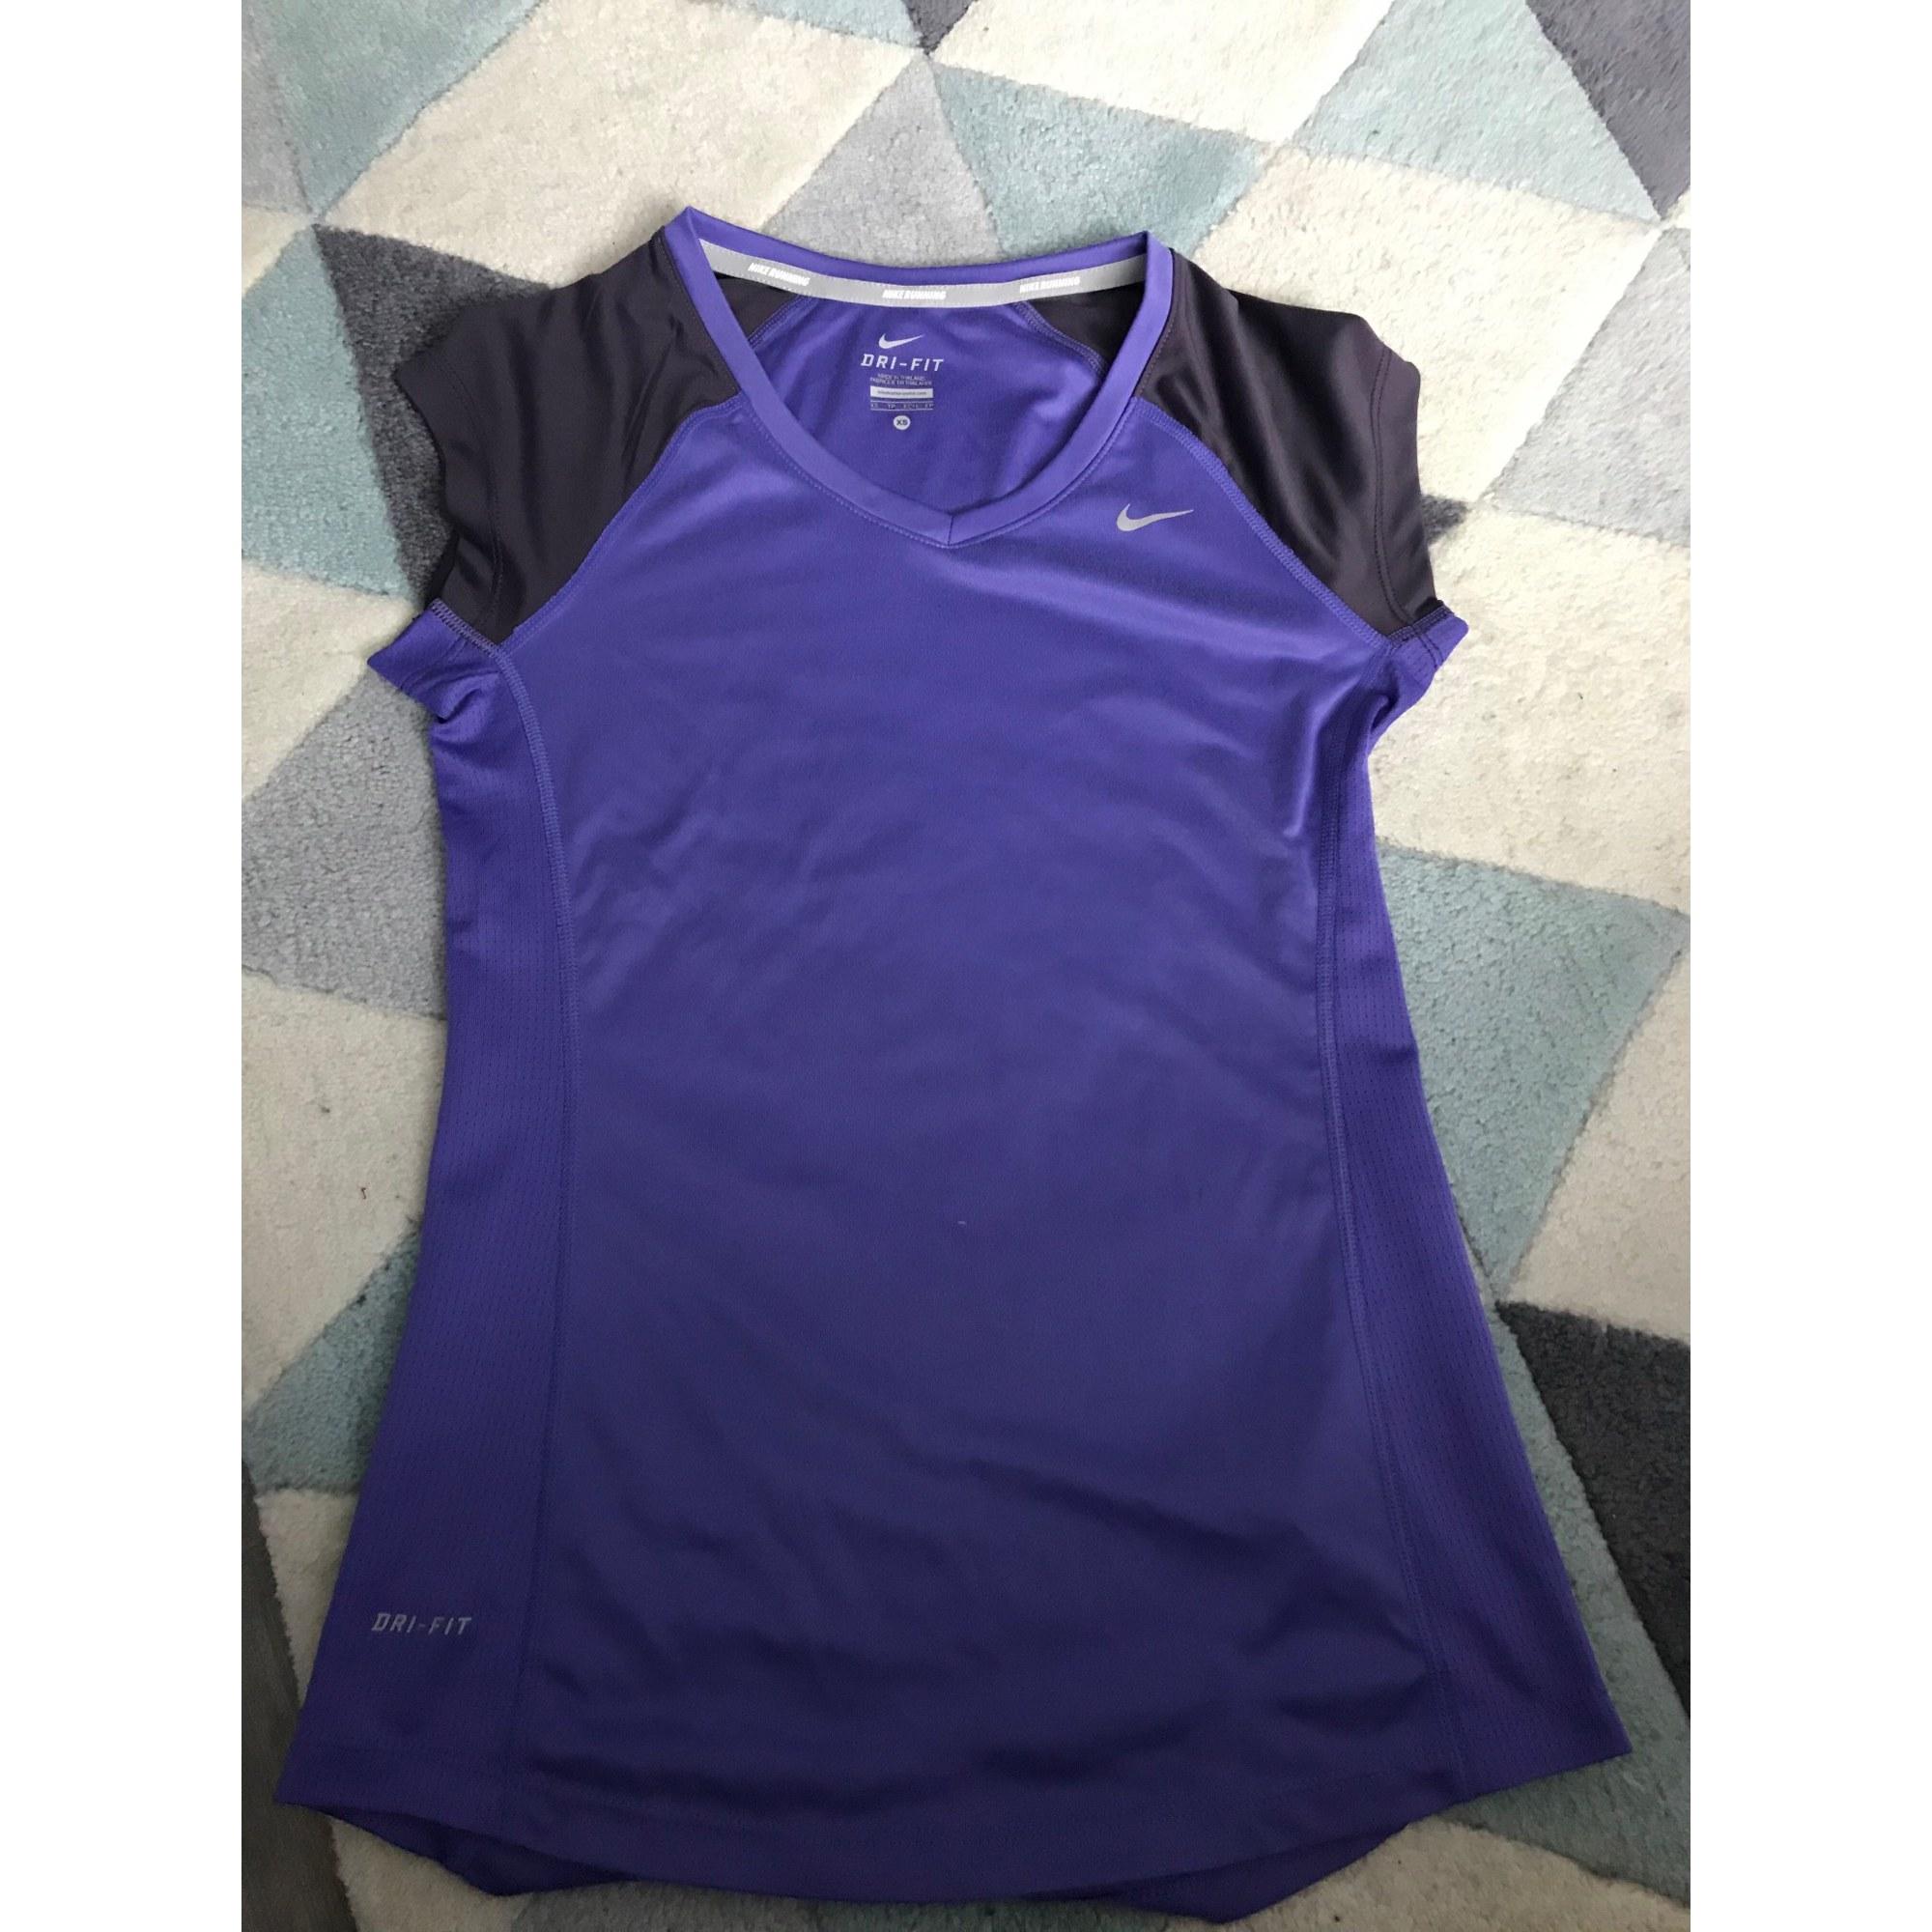 Top, tee-shirt NIKE Violet, mauve, lavande